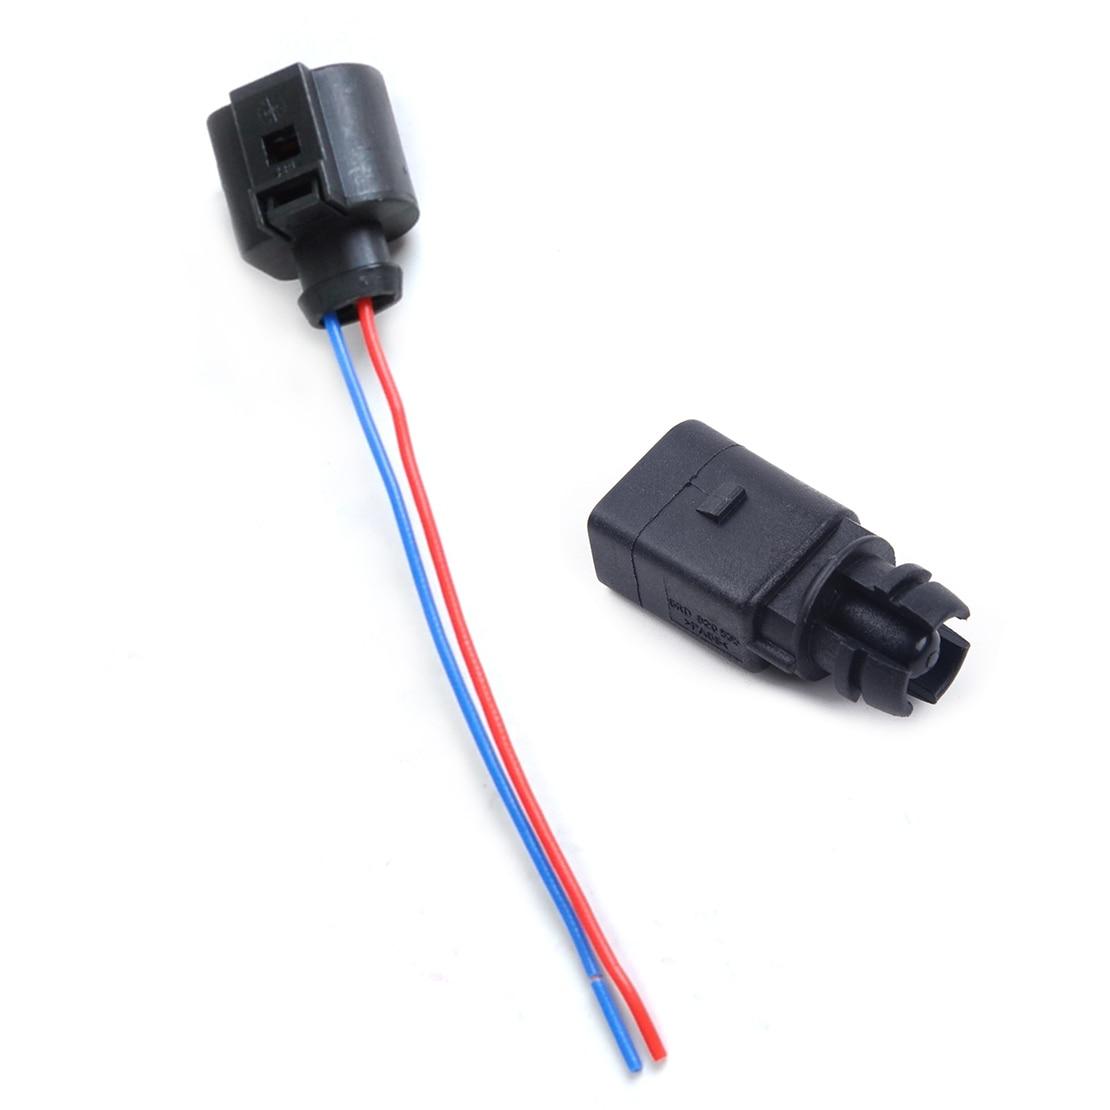 CITALL Neue Umgebungs luft temperatur sensor & Elektrische 2 Pin Stecker Stecker Kabelbaum Fit für Audi VW 6rd820535 1j0973702